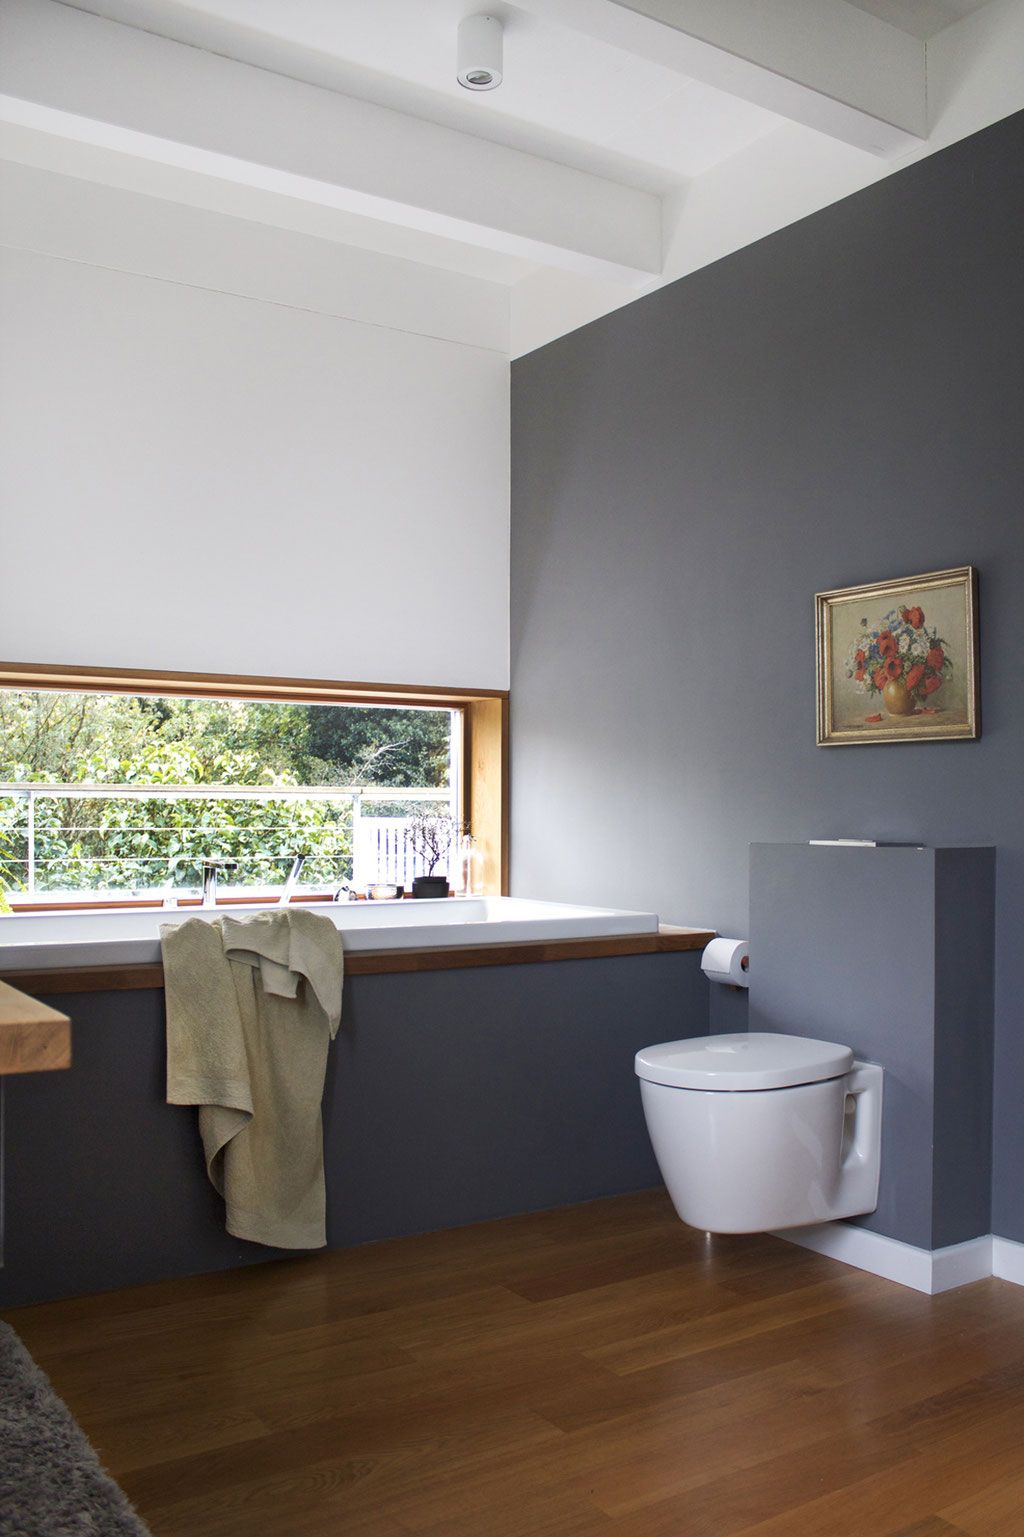 dieartige - Familienbad | Badewanne, WC + graue Wand | Luxus ...